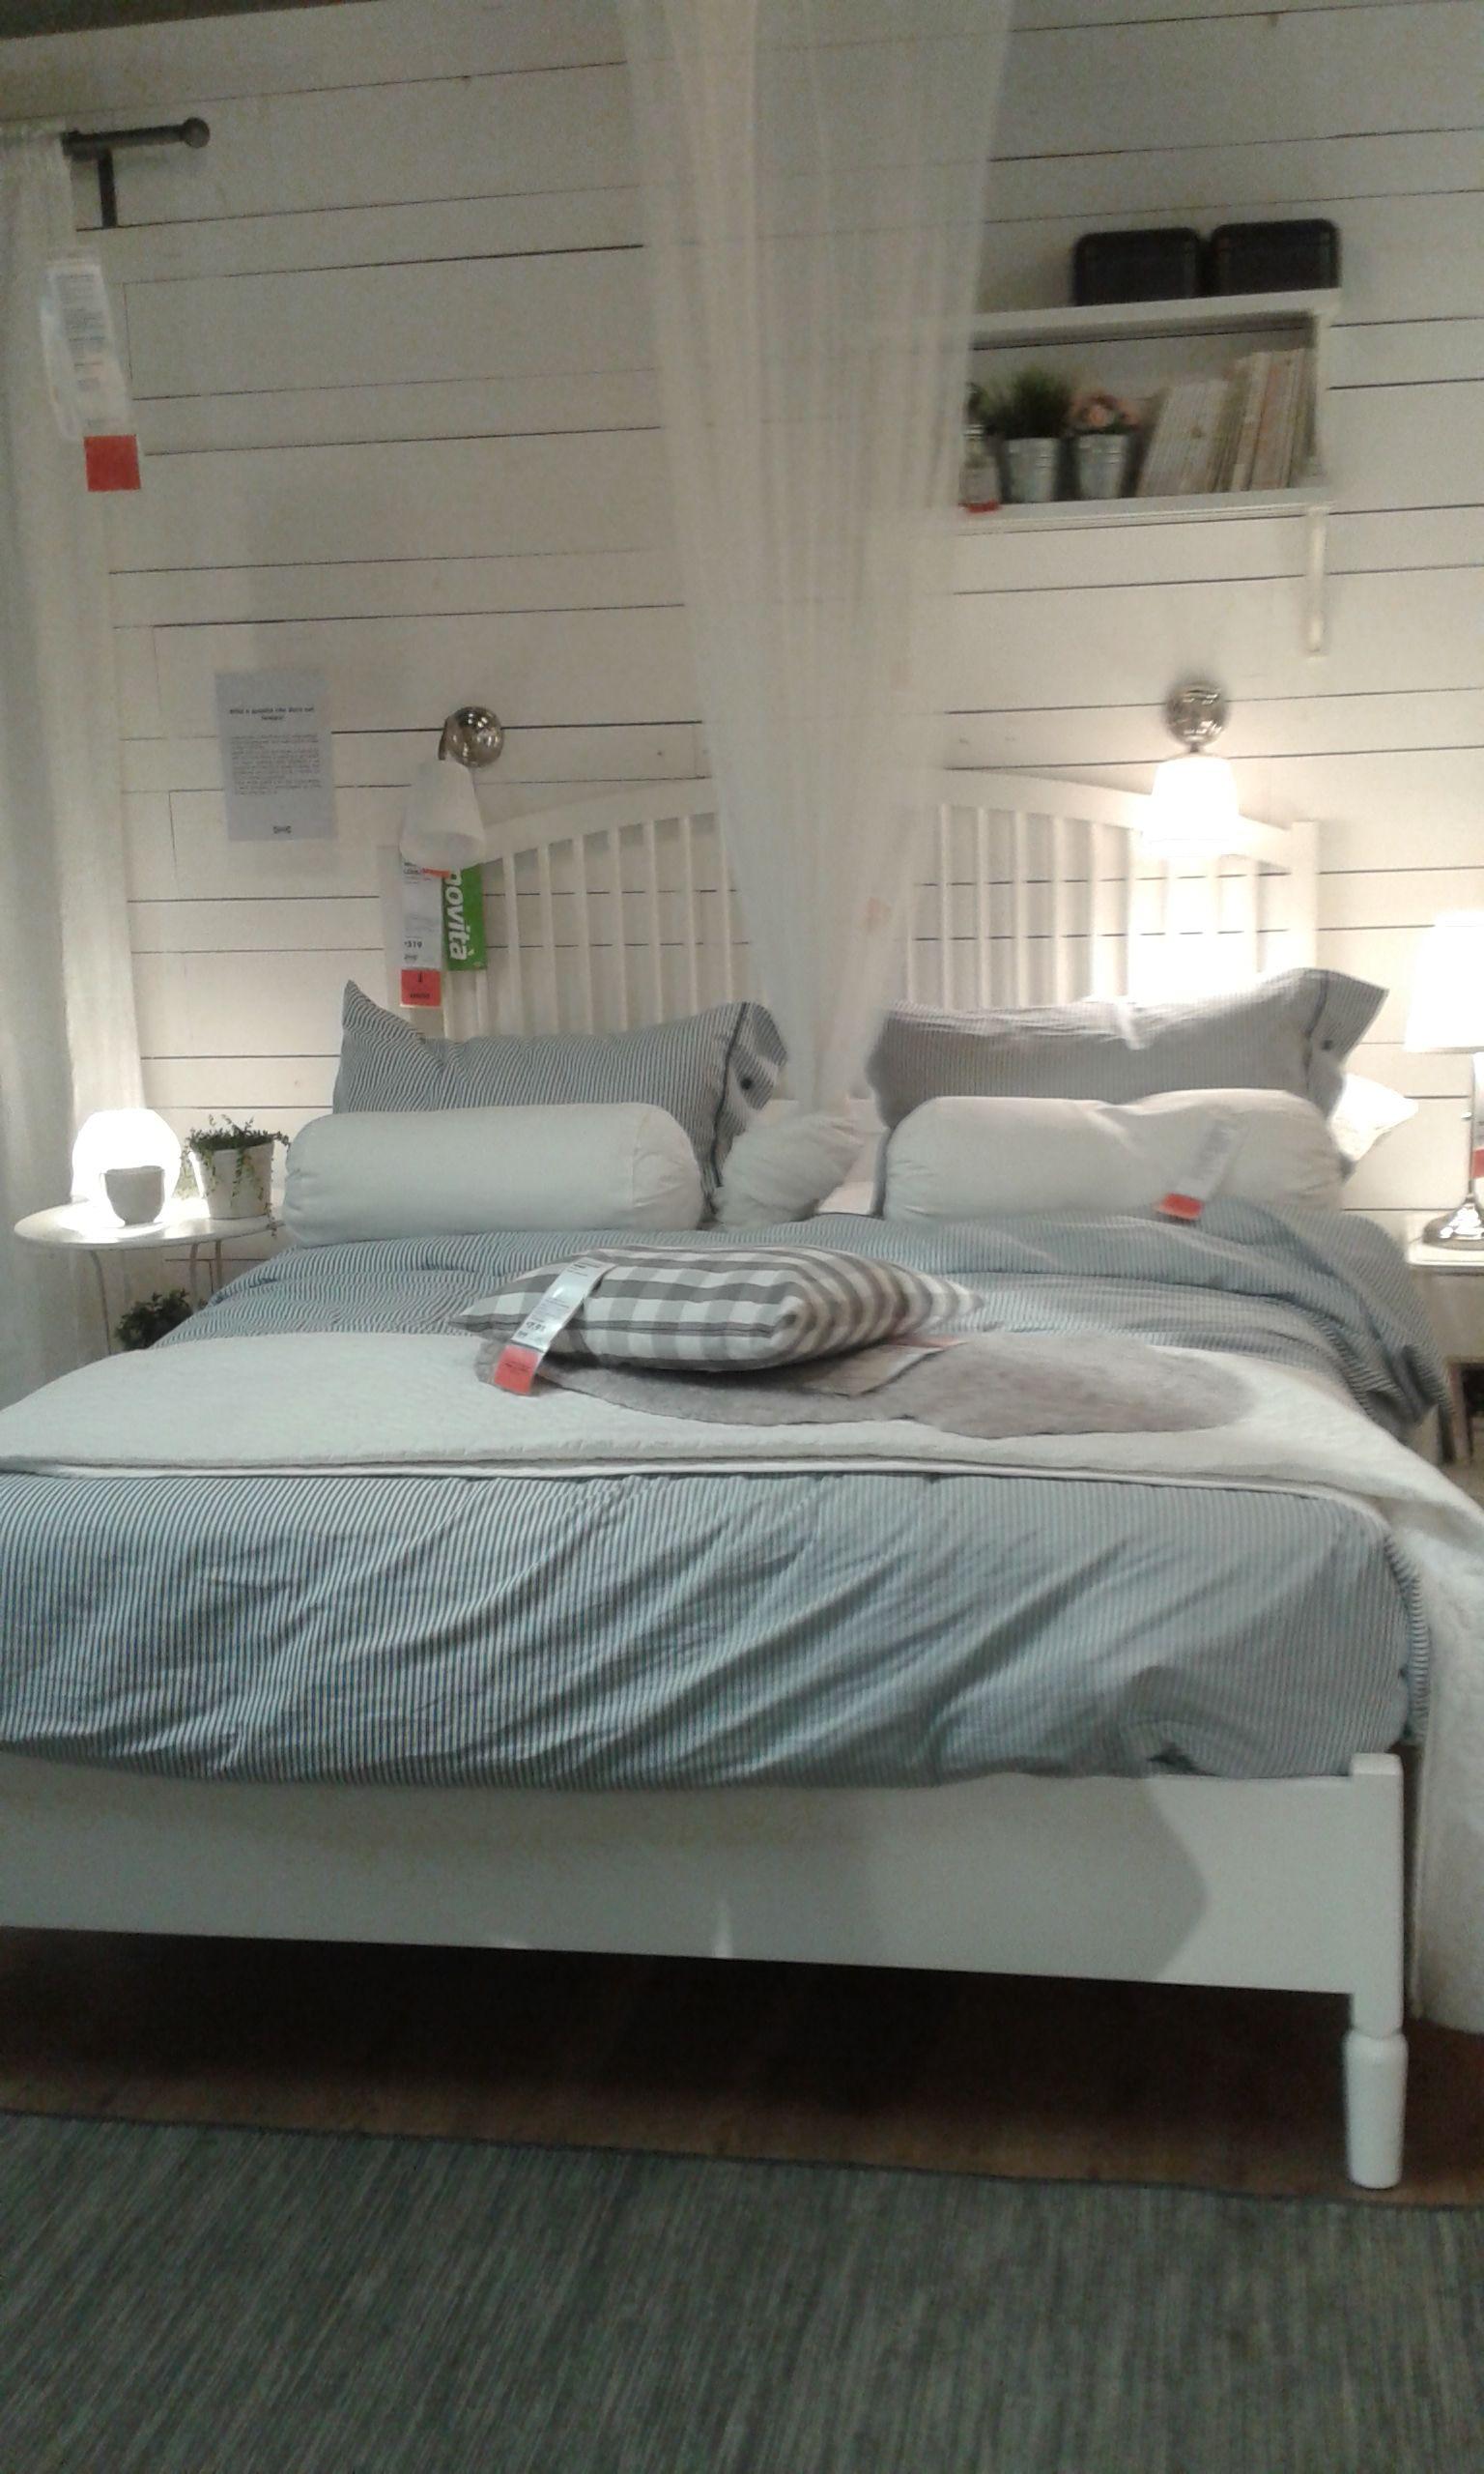 camera da letto IKEA | House | Camera da letto ikea, Letto ikea e ...